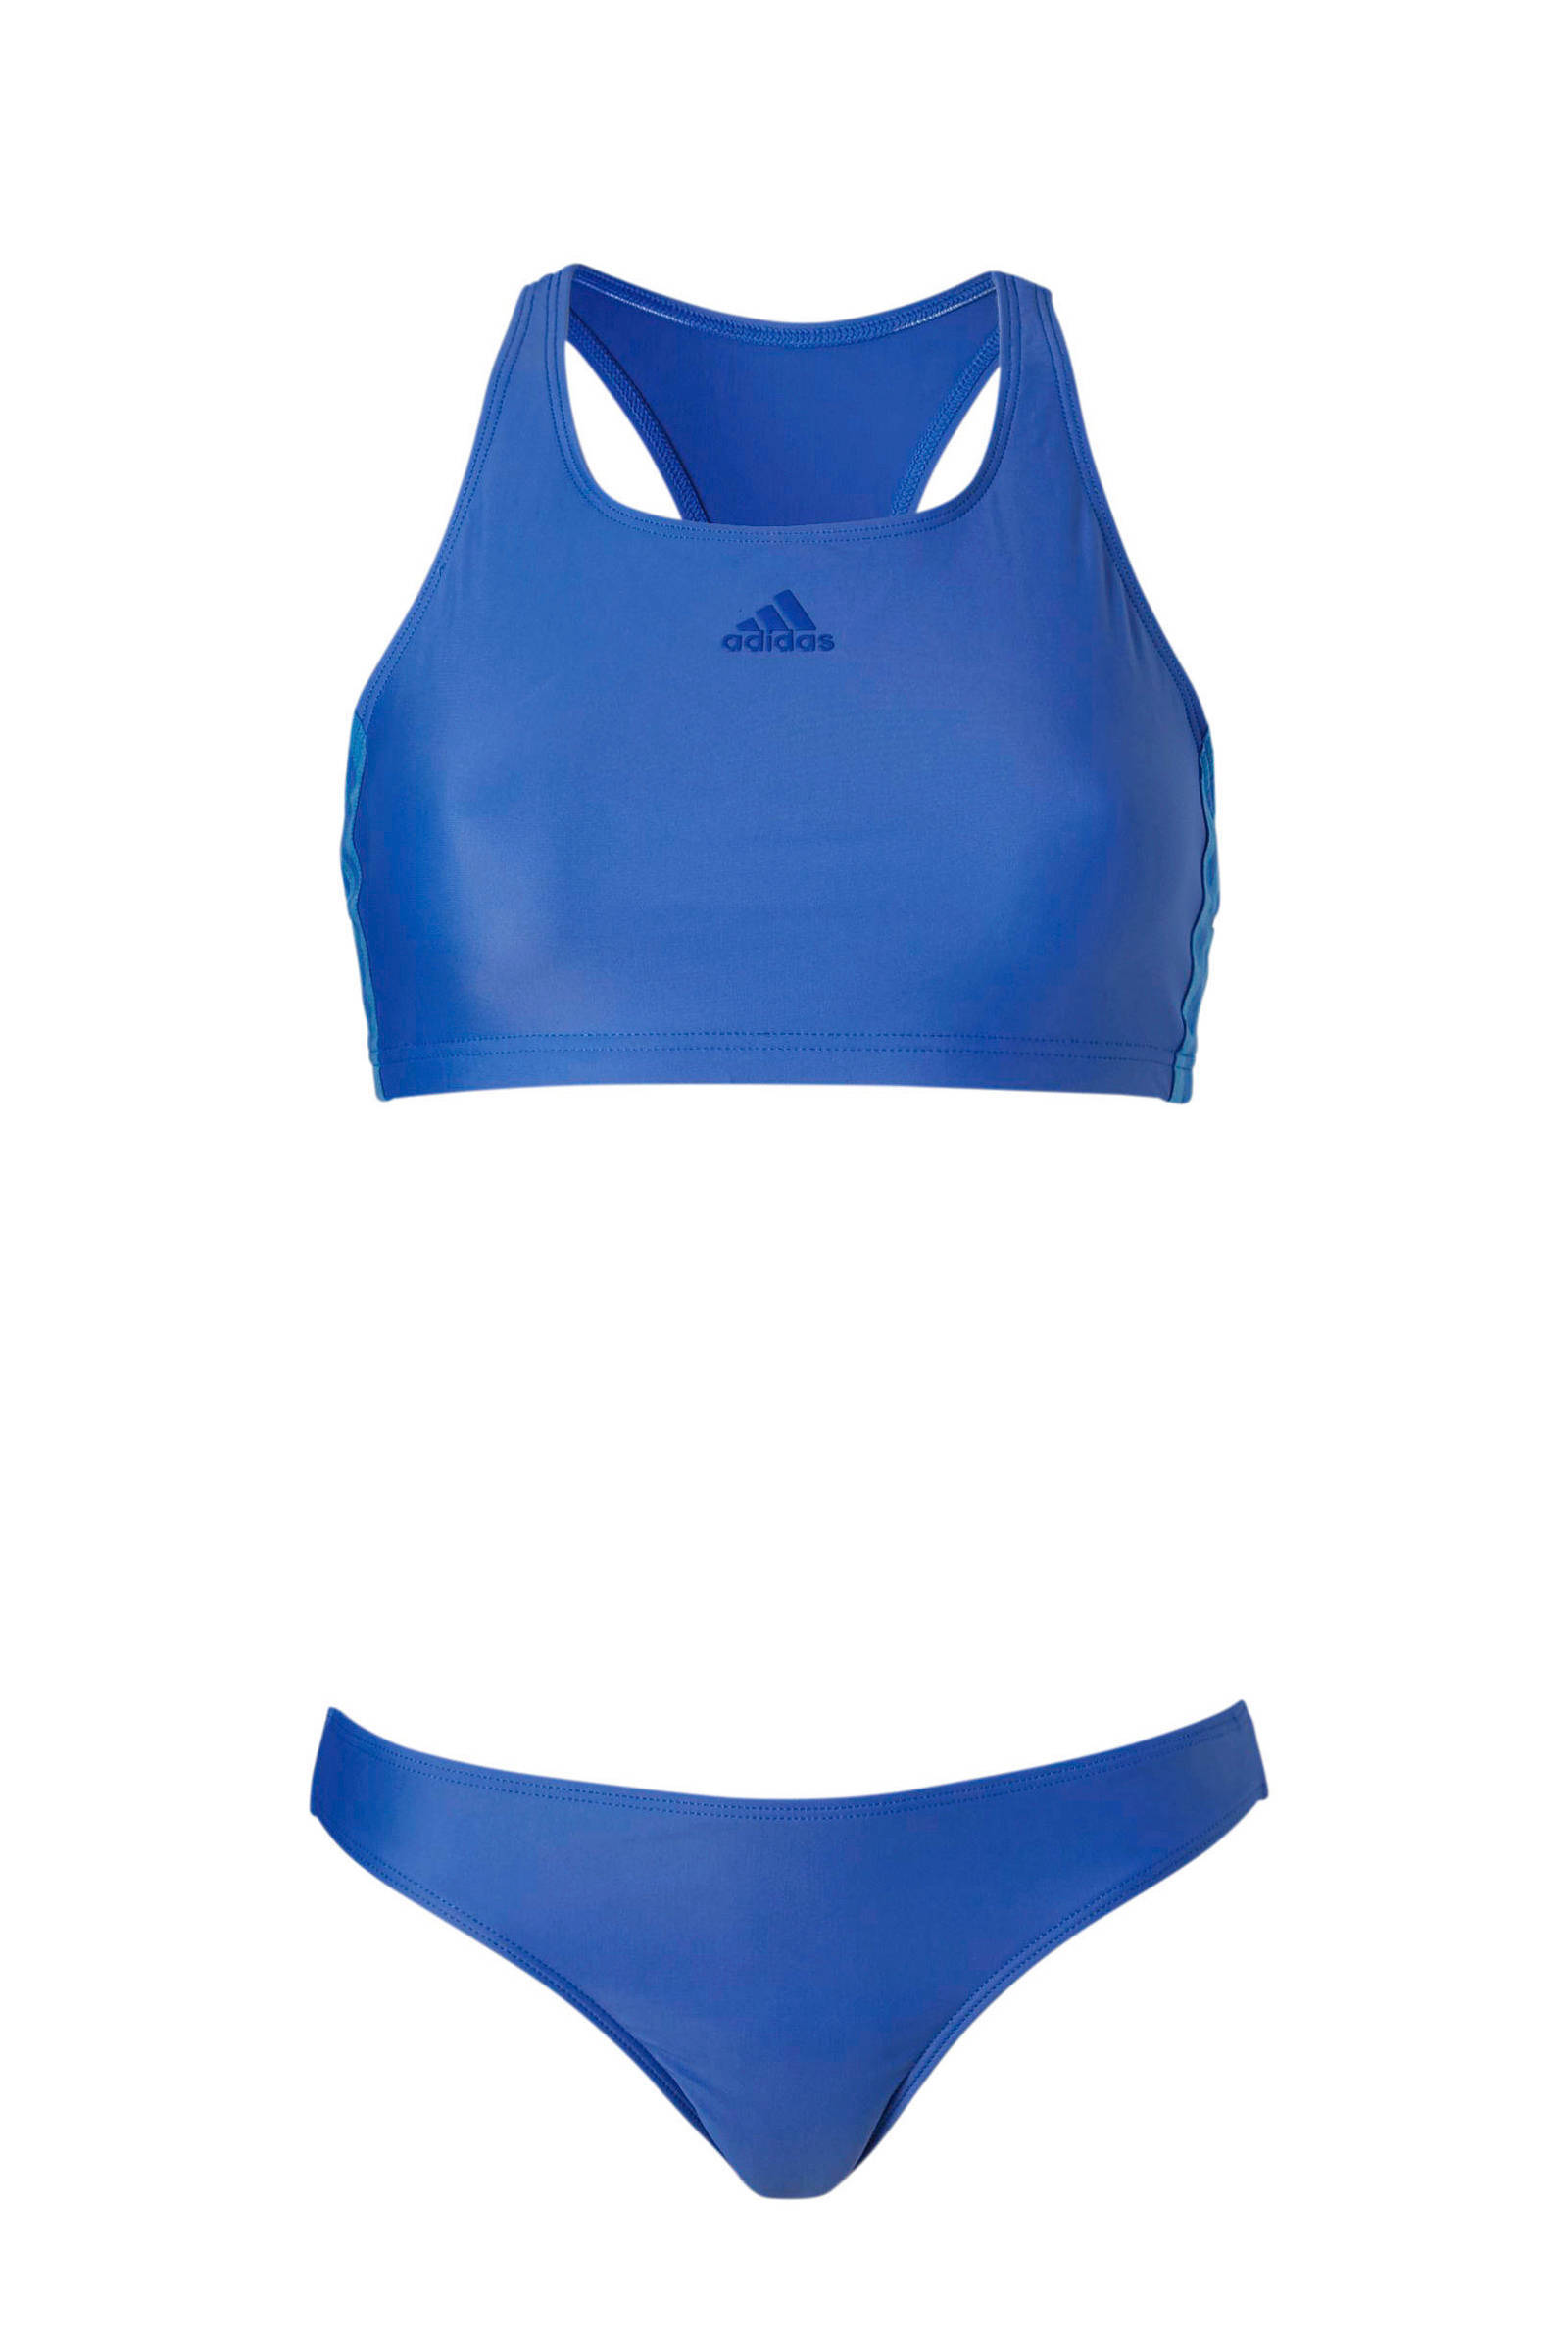 adidas Performance crop bikini blauw | wehkamp